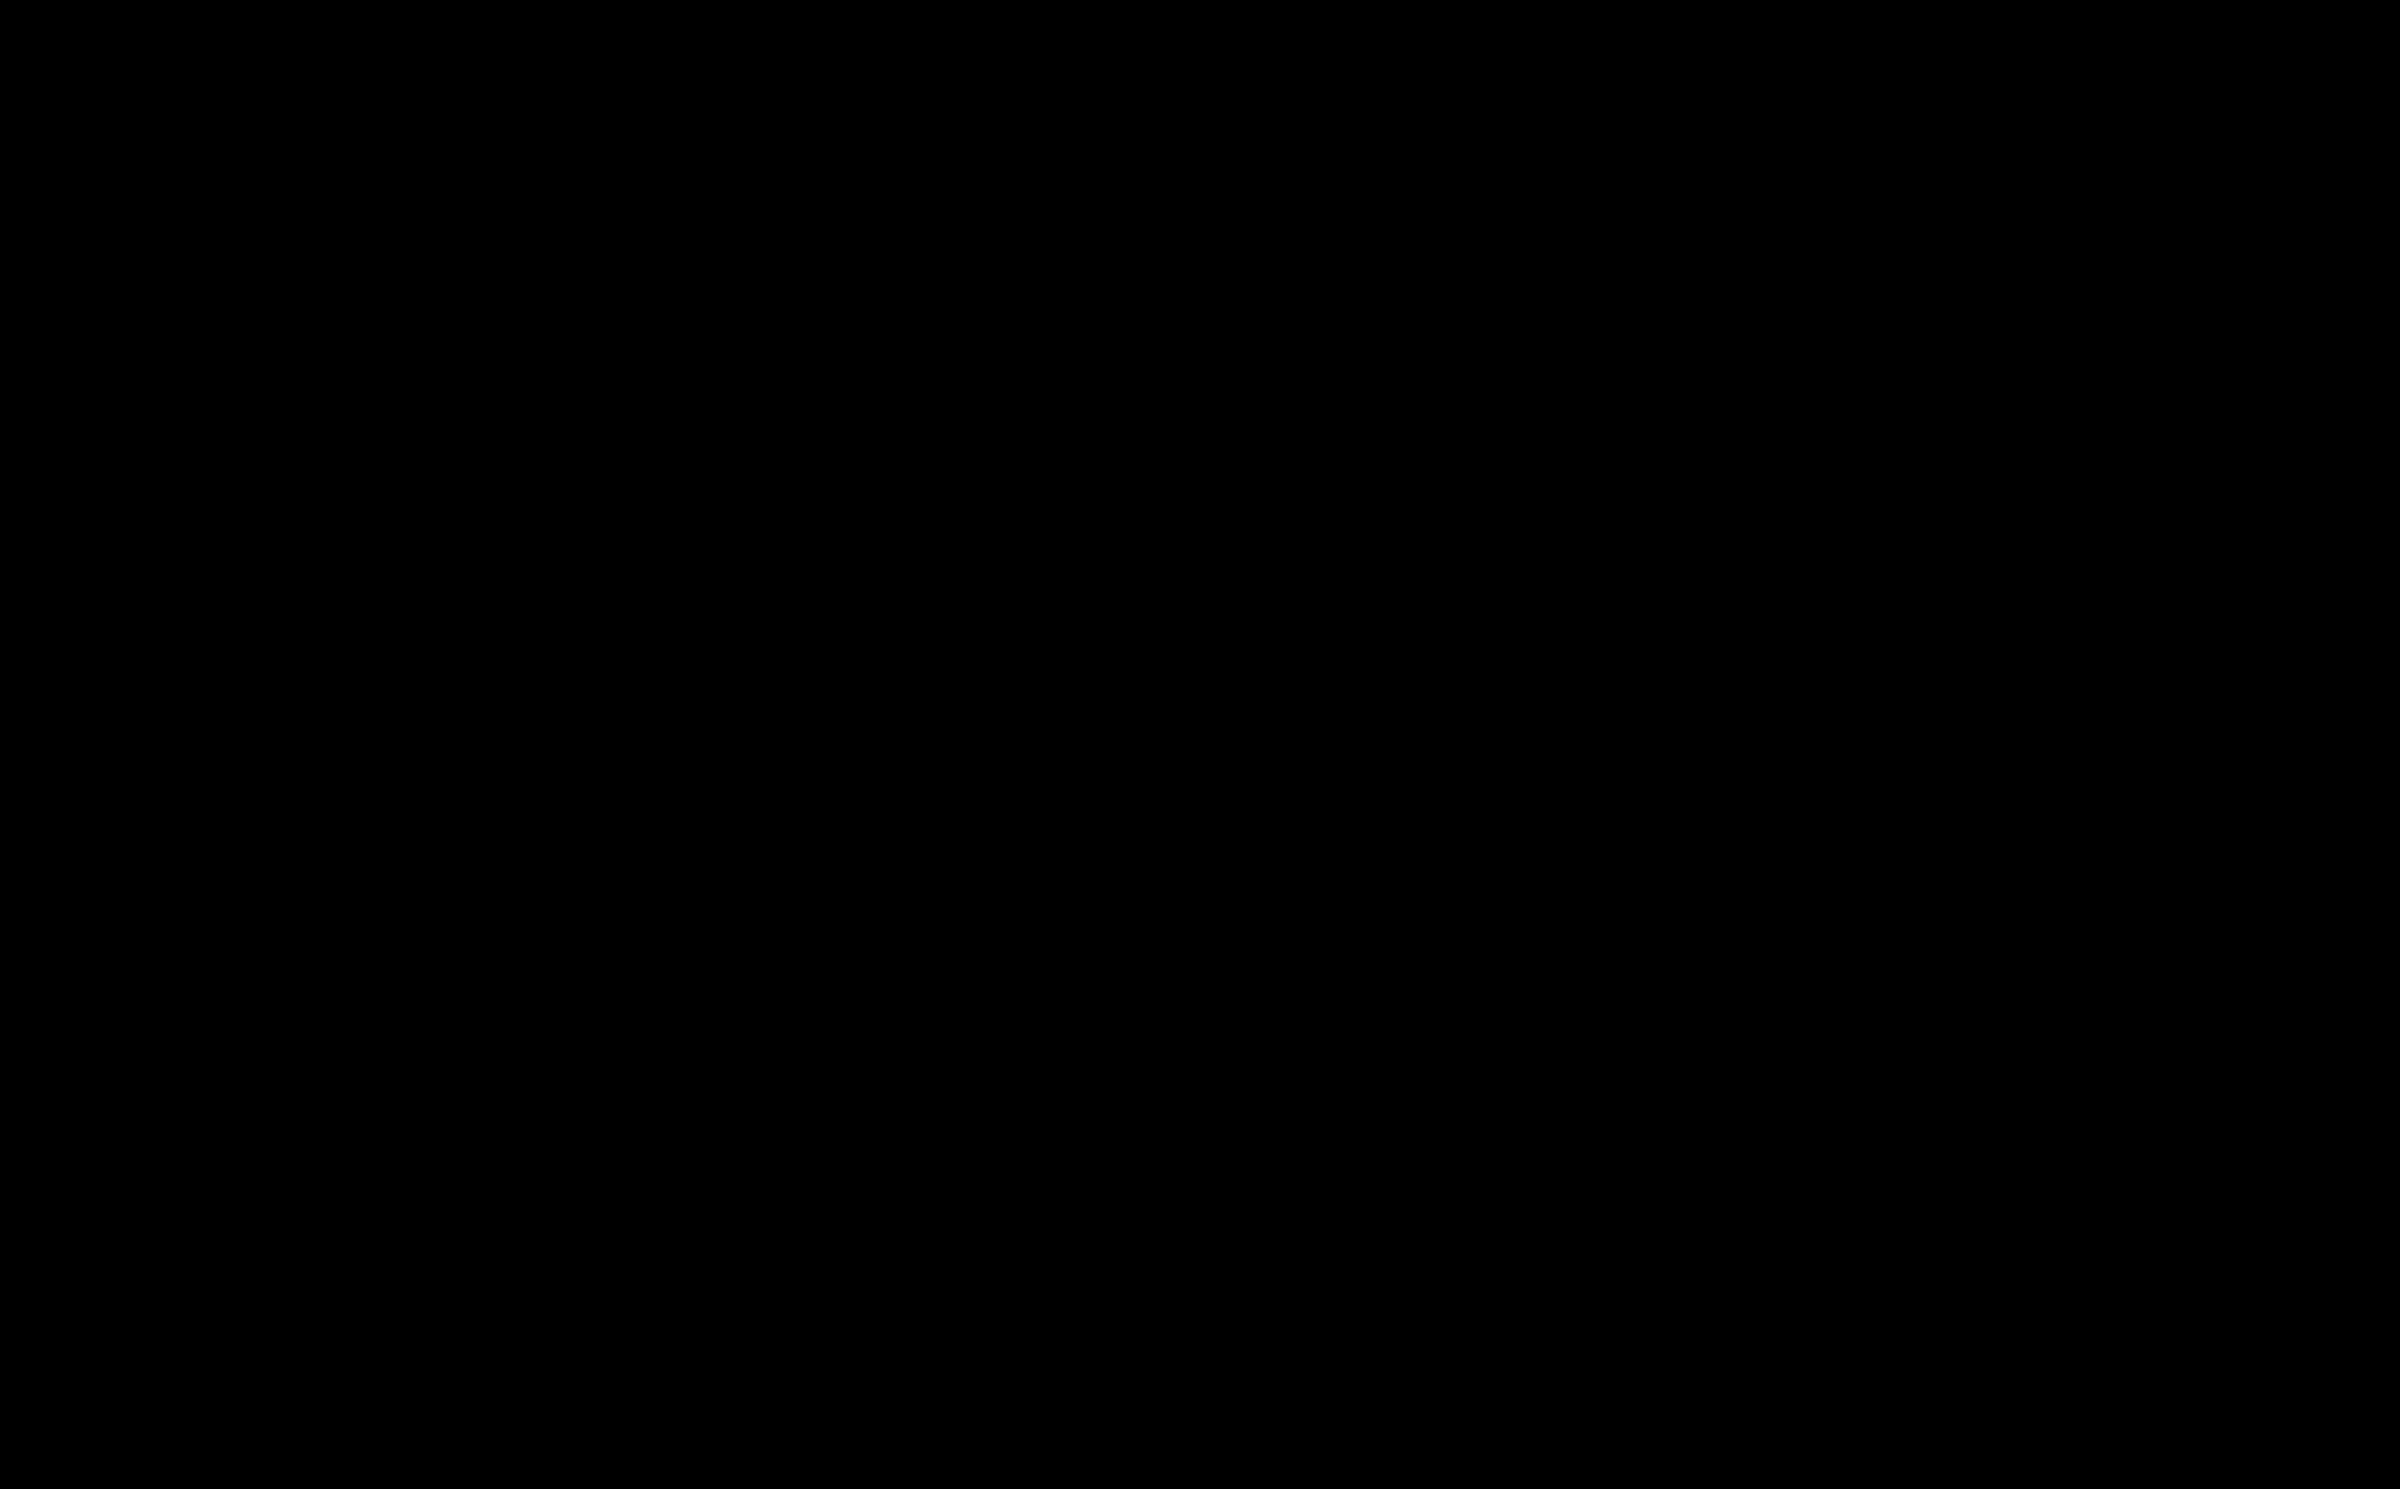 BIG IMAGE (PNG) - Noah PNG Black And White